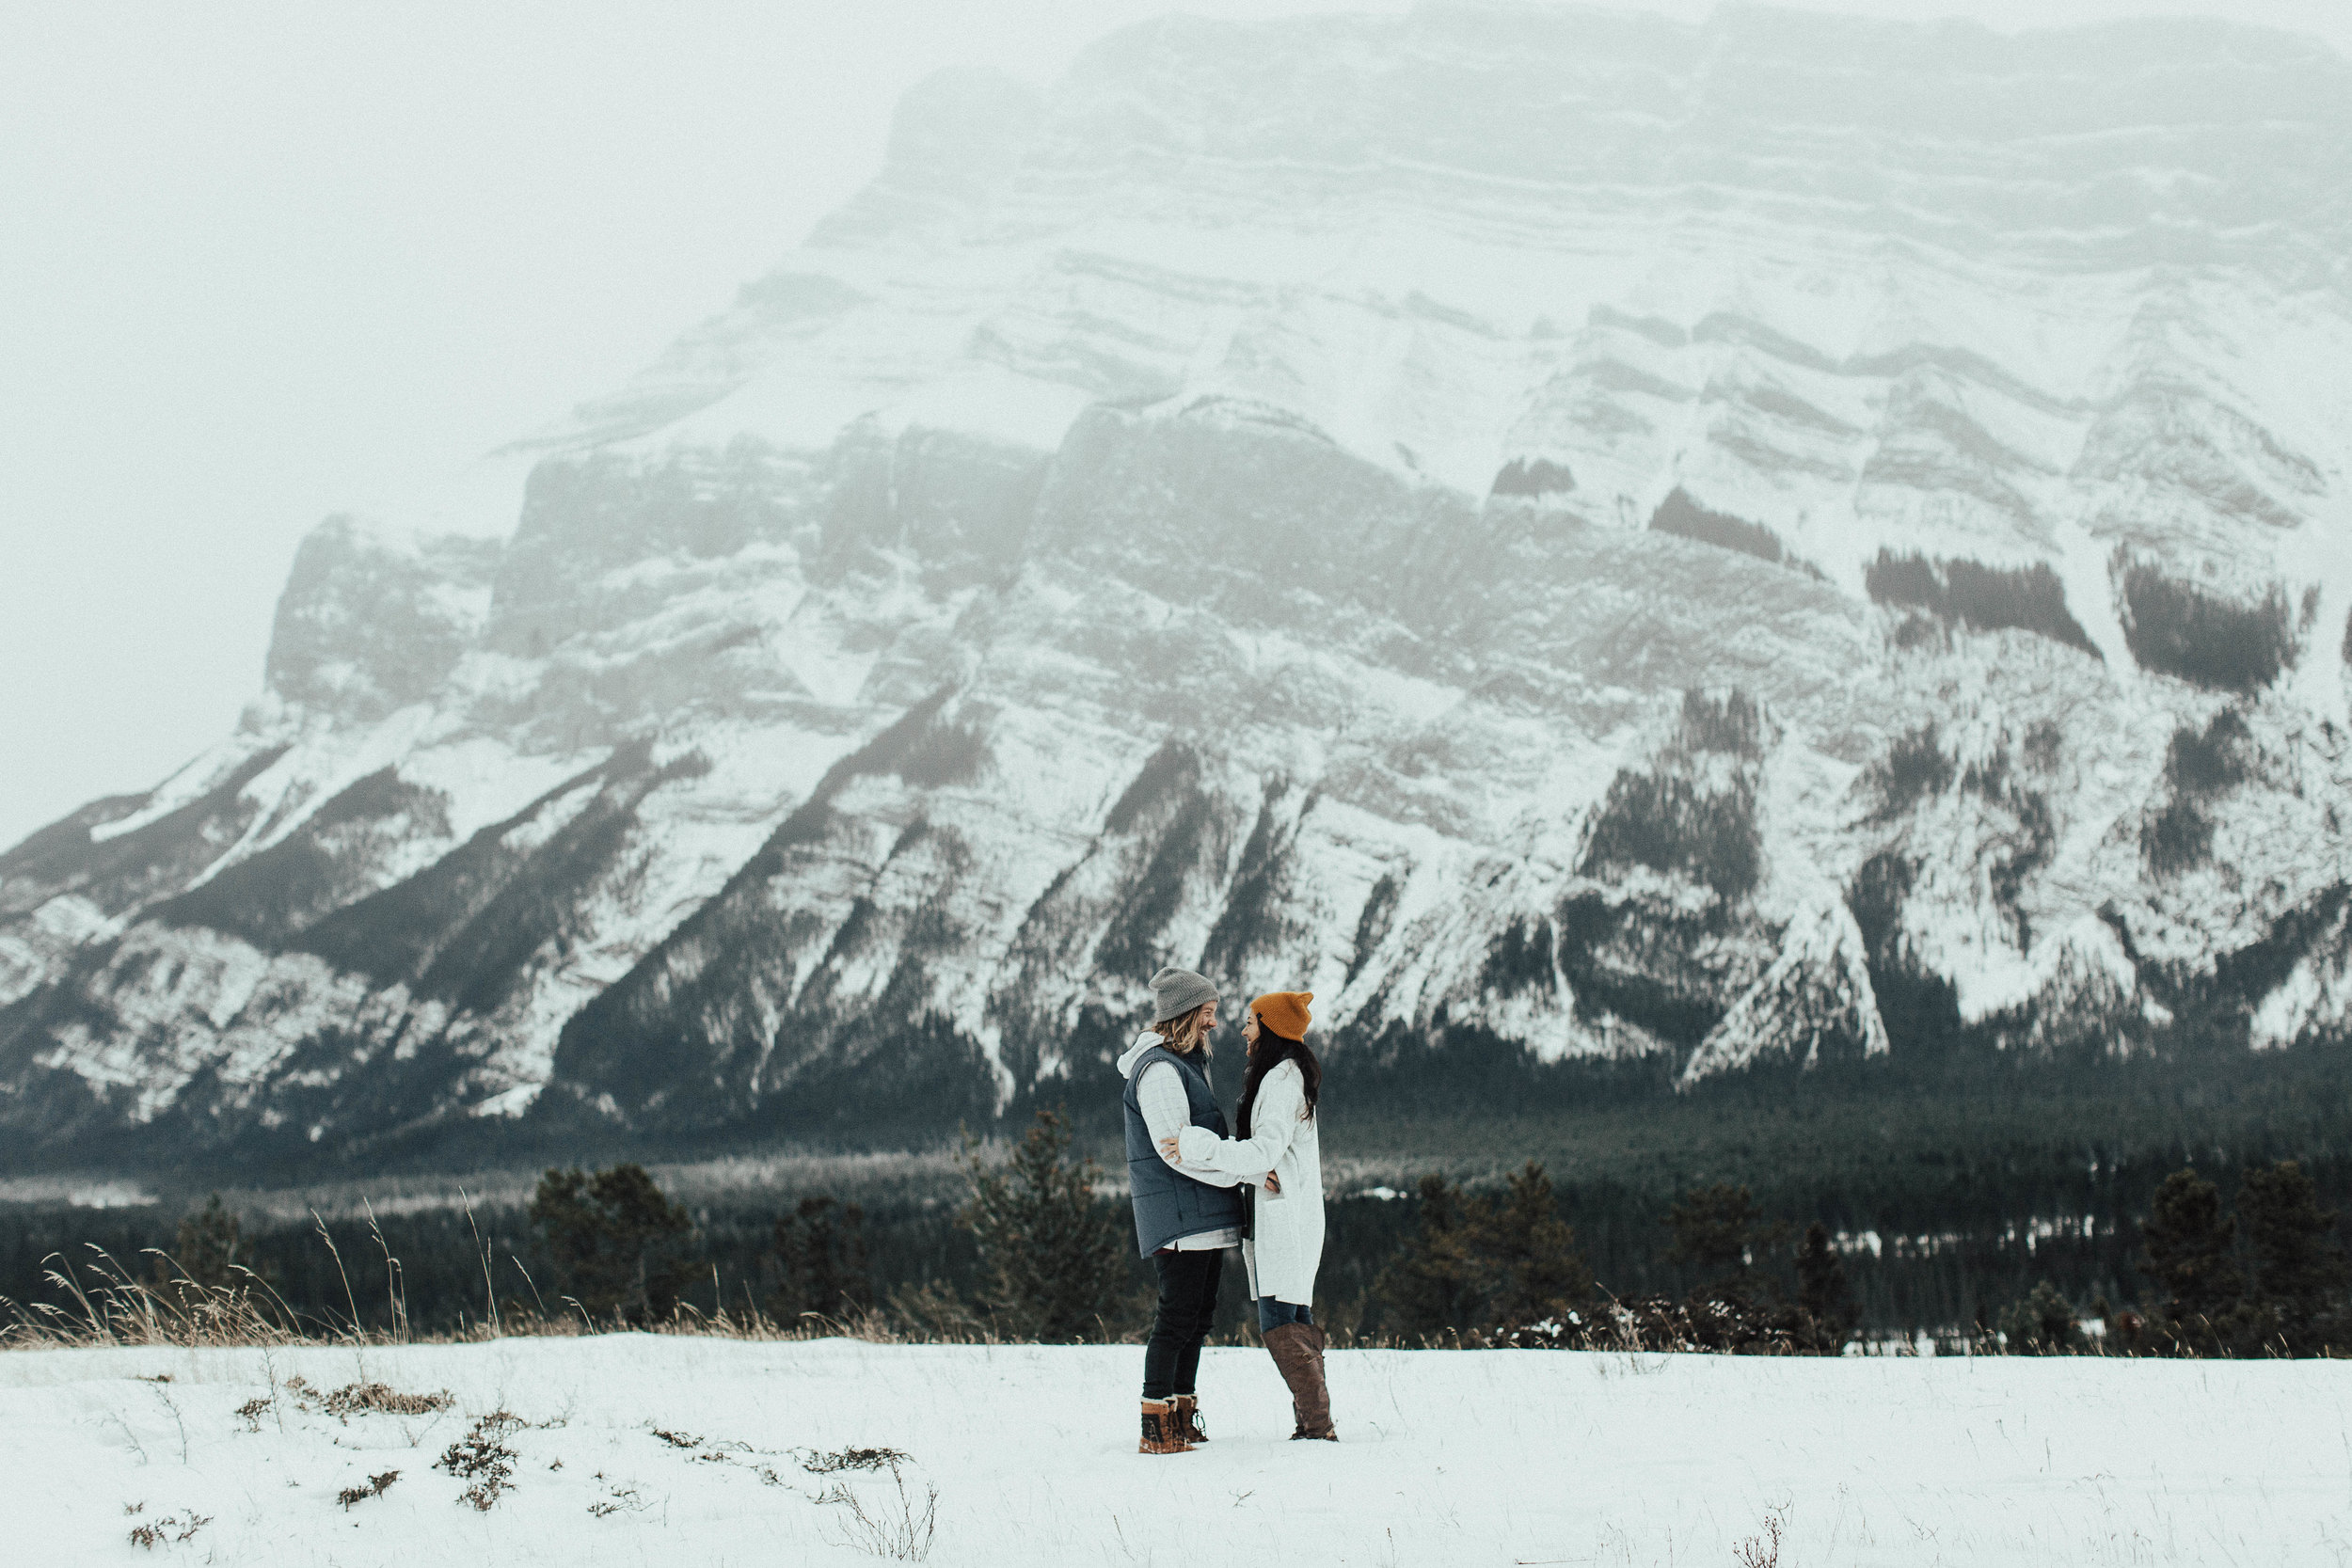 Banff Engagement Photographer - Winter Mountain Adventure Engagement Session - Michelle Larmand Photography-002